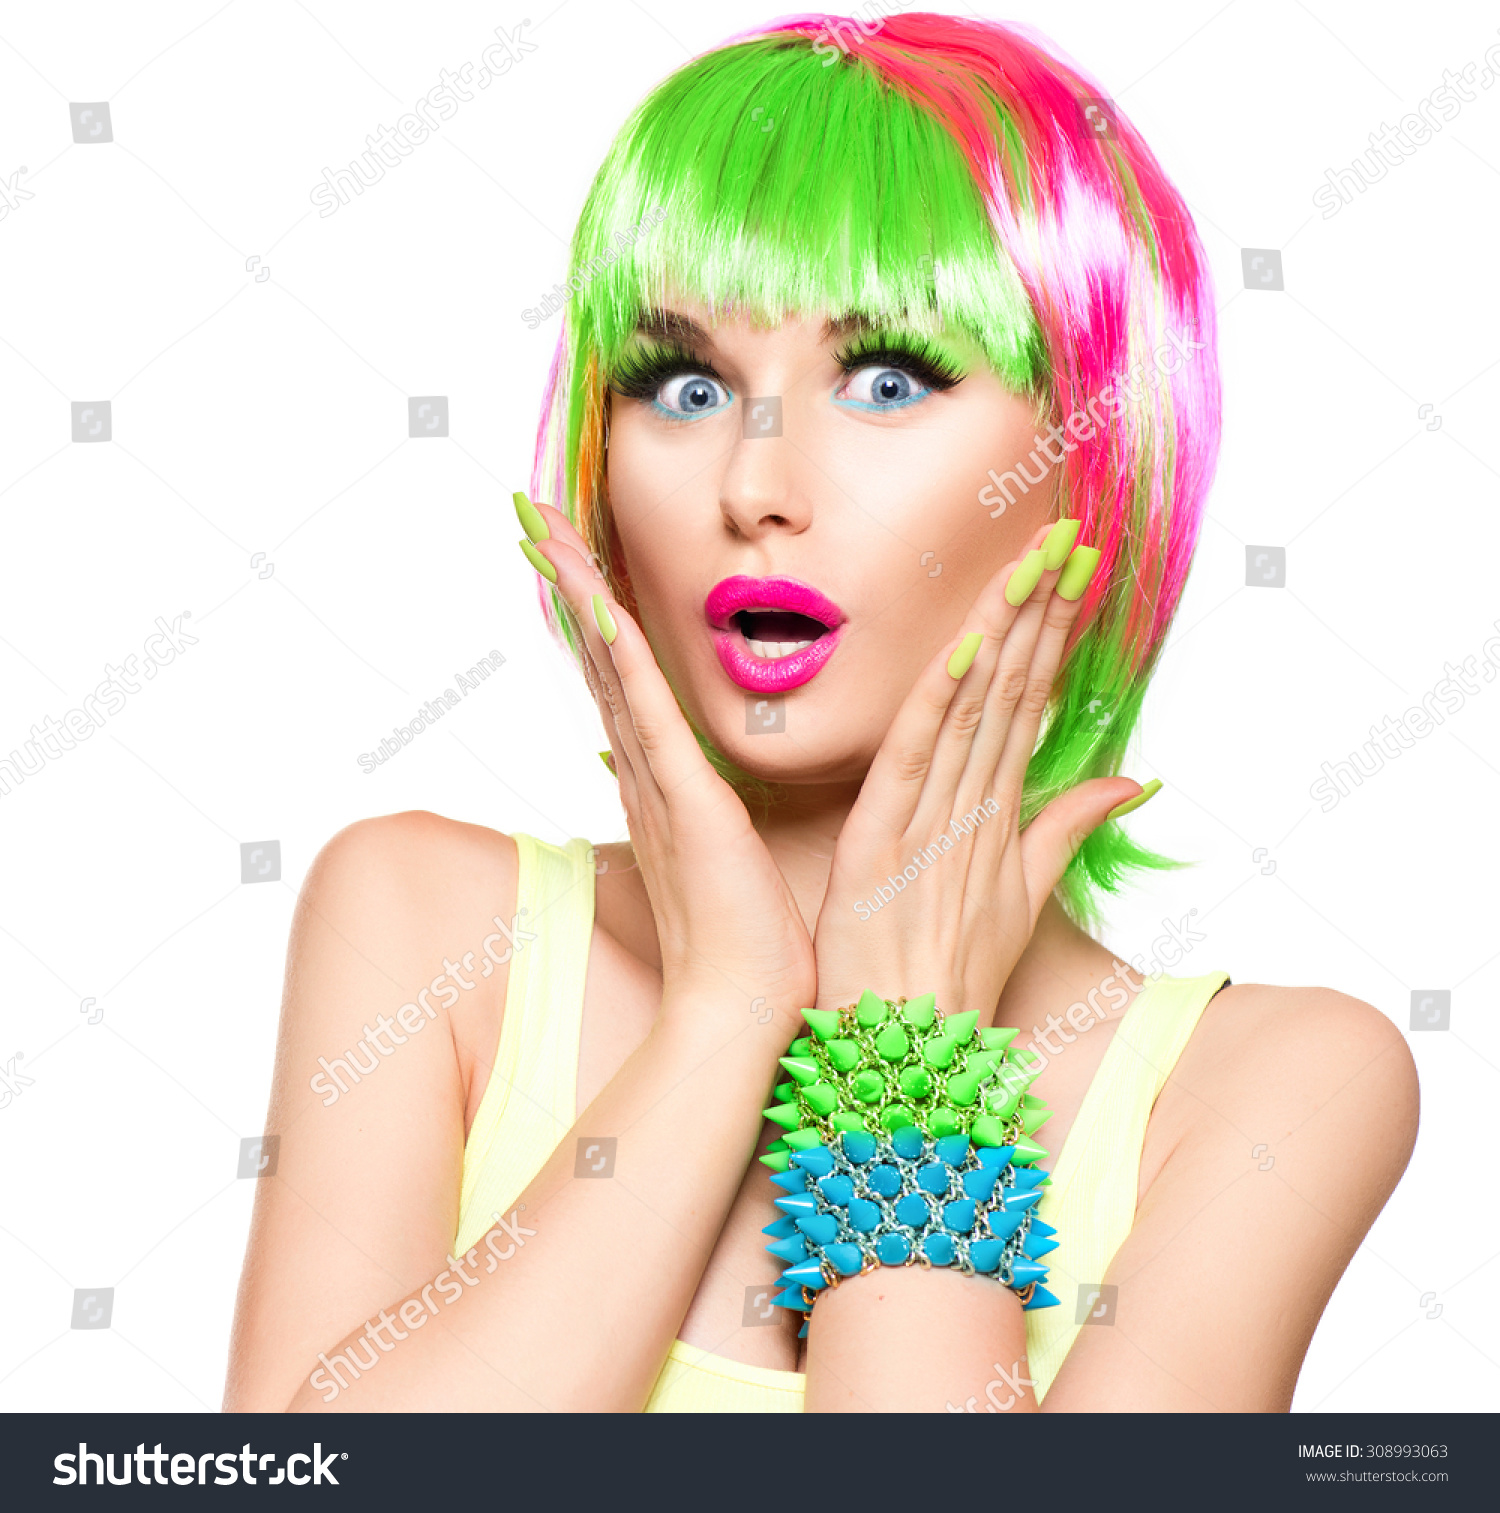 Surprised Beauty Fashion Model Girl Colorful Stock Photo - Haircut girl model